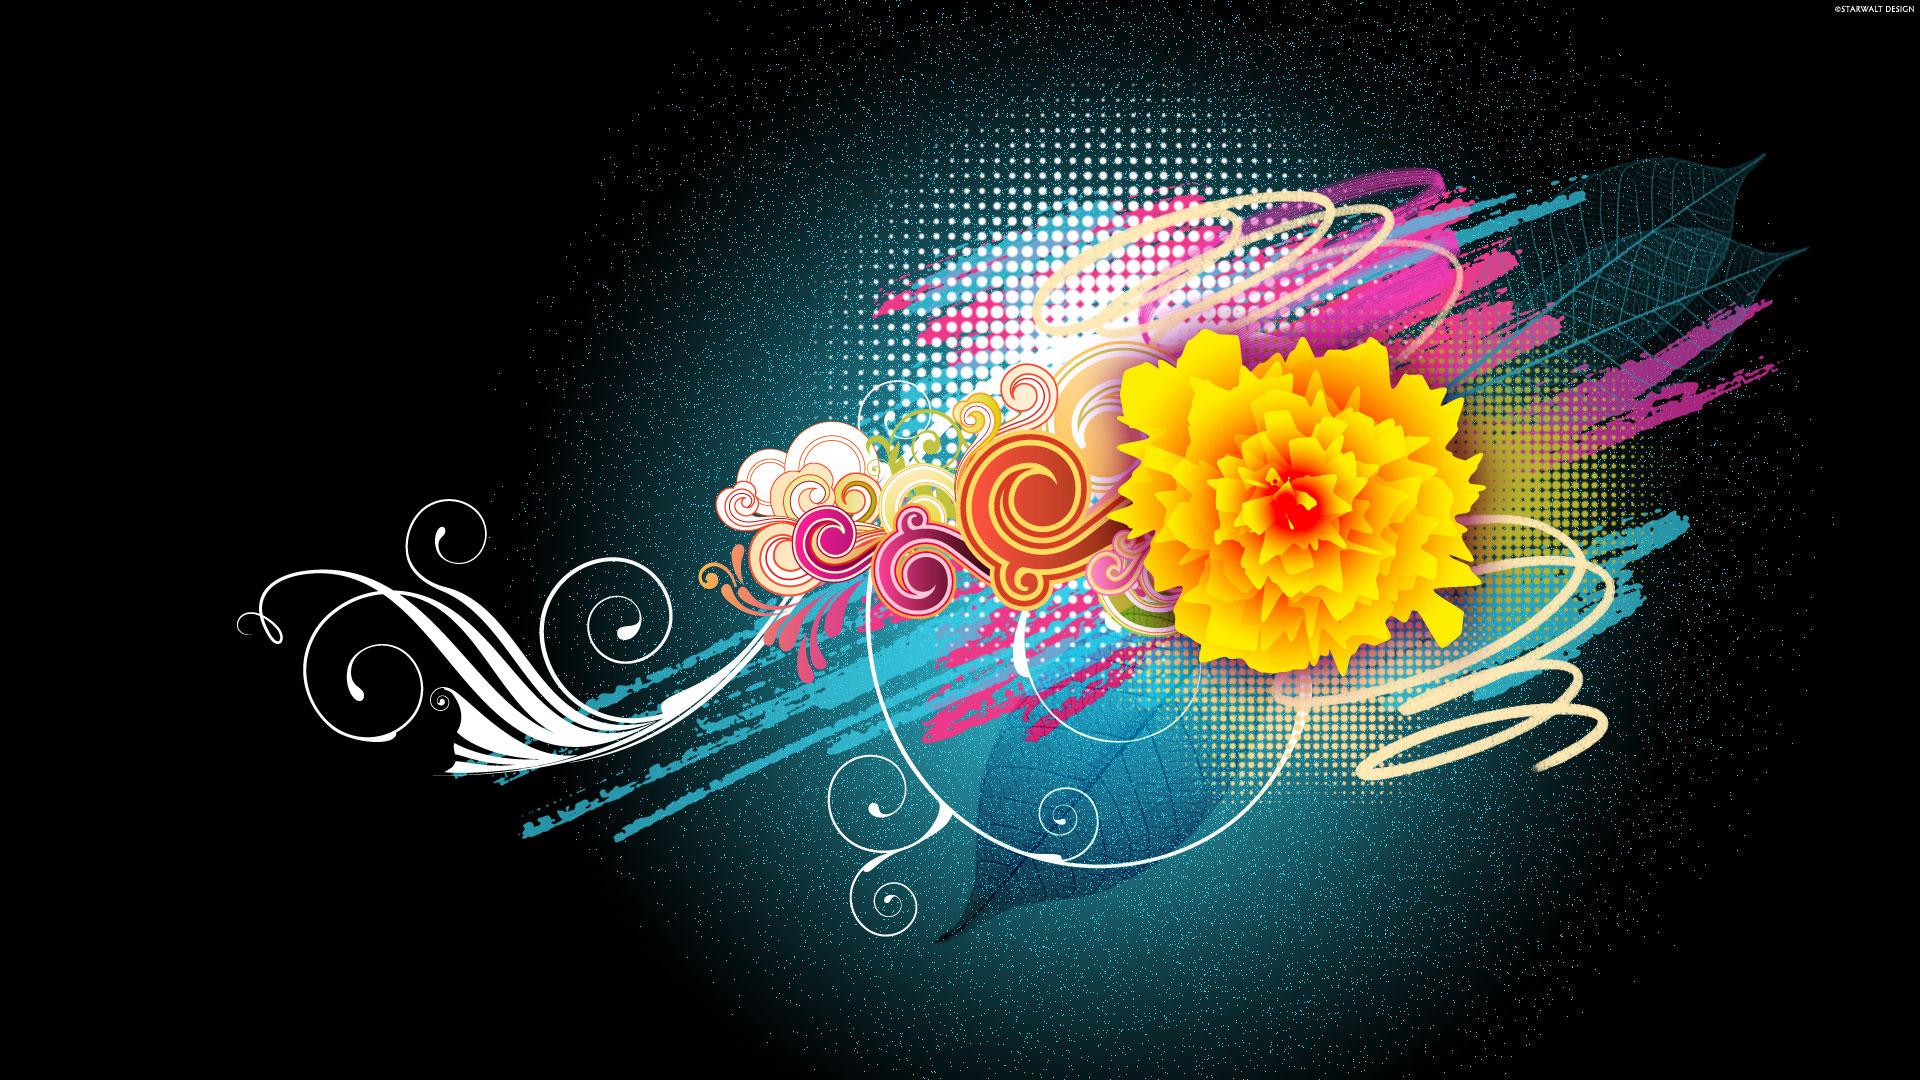 HD Wallpapers Flower Vector Designs 1080p